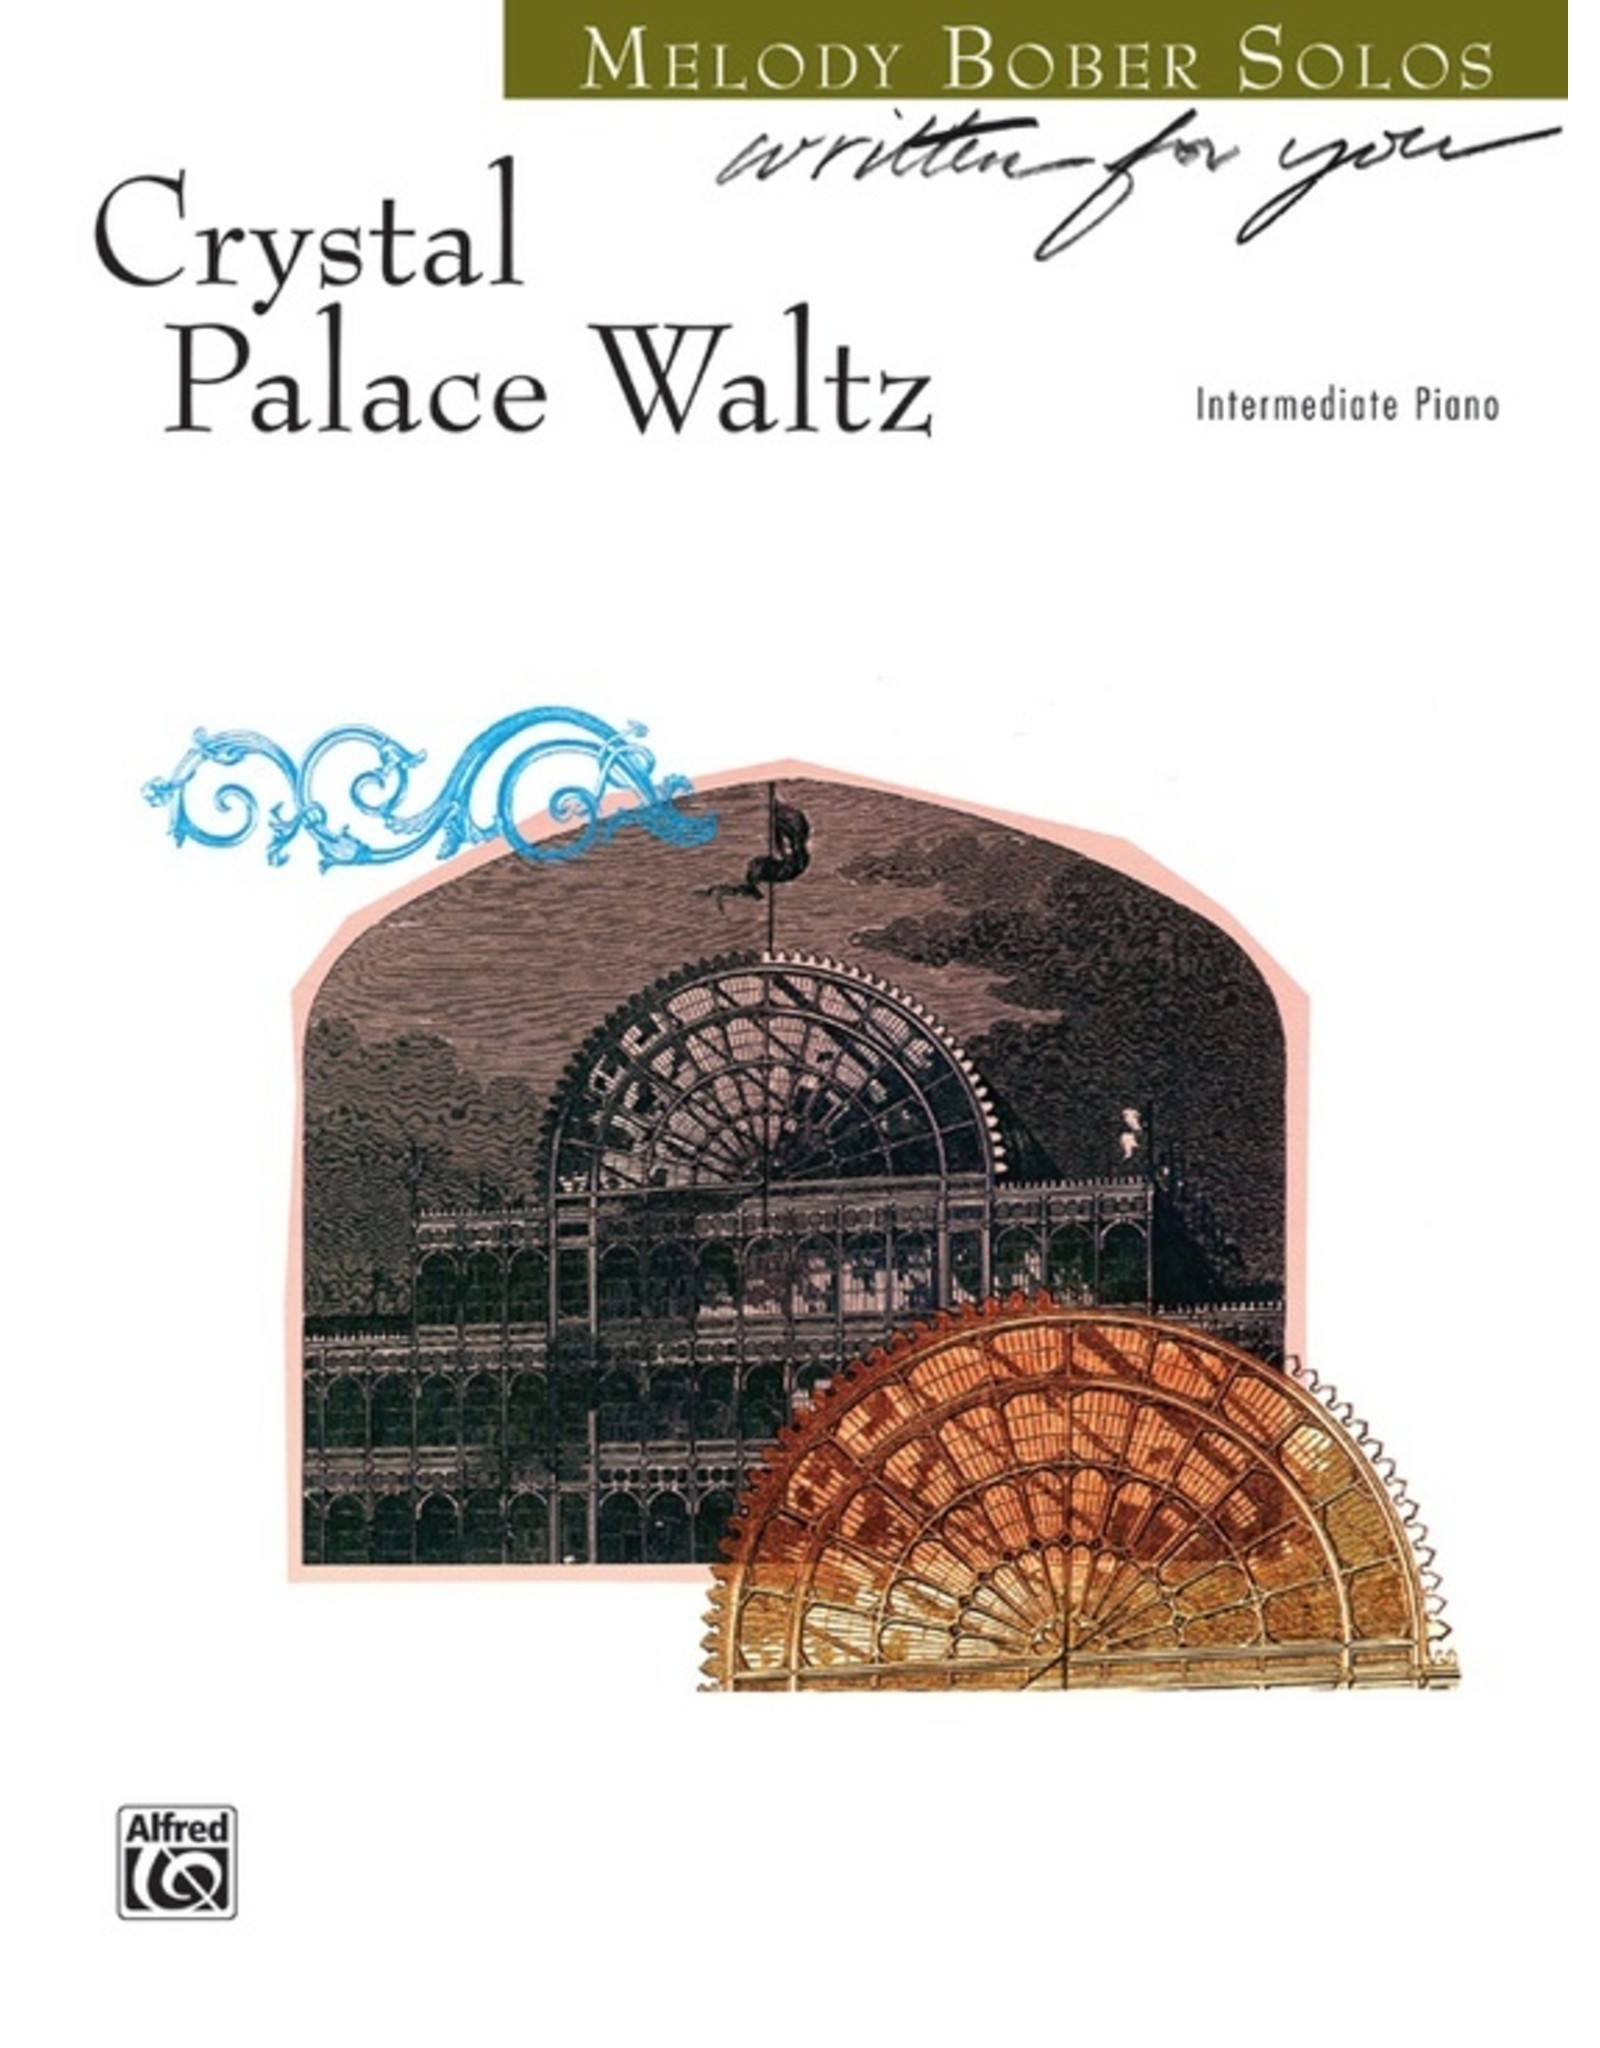 Alfred Bober - Crystal Palace Waltz